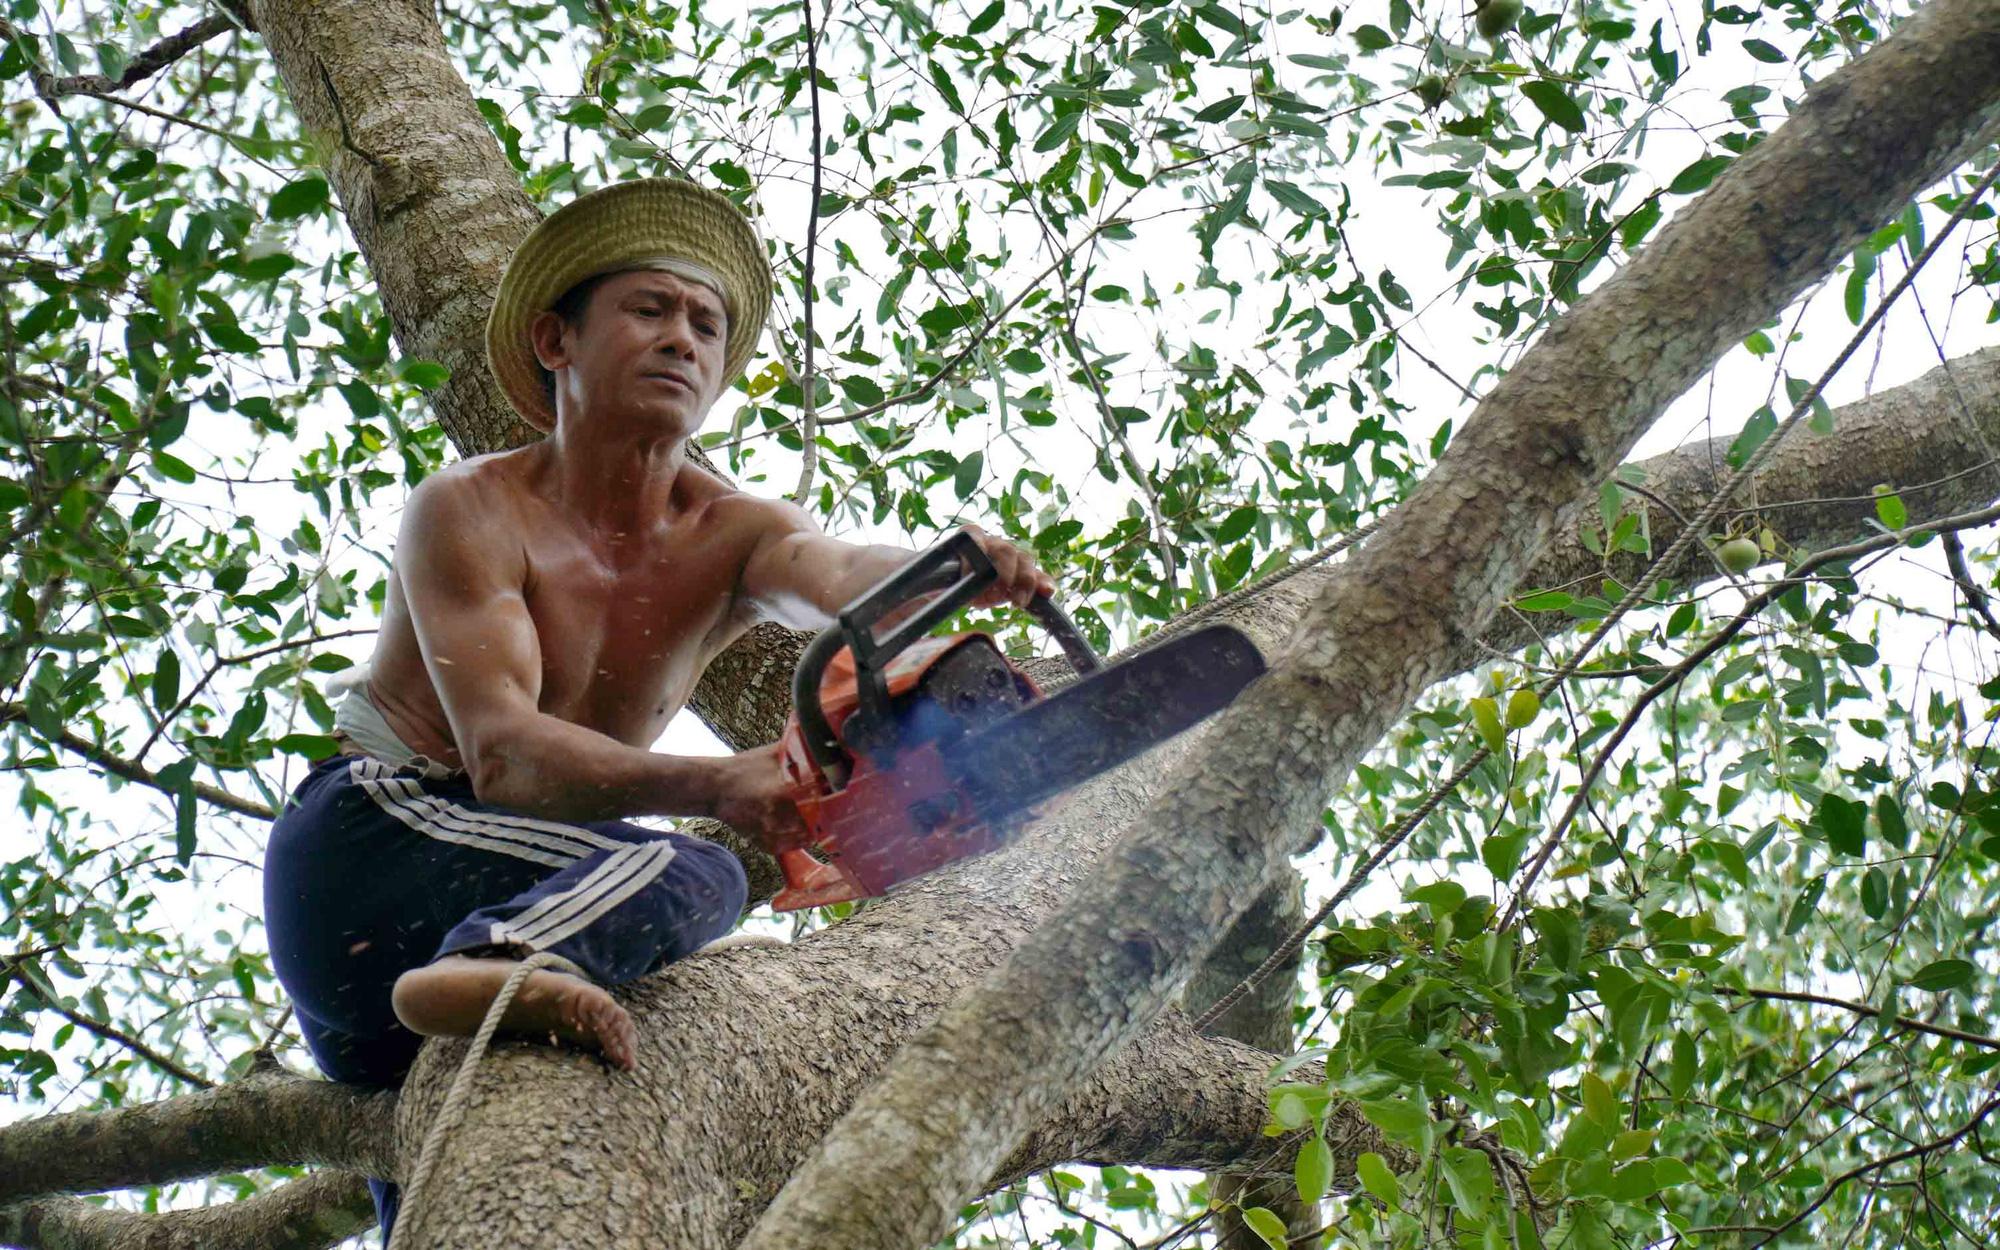 Tree trimmer dubbed 'Monkey King' in Vietnam's Mekong Delta